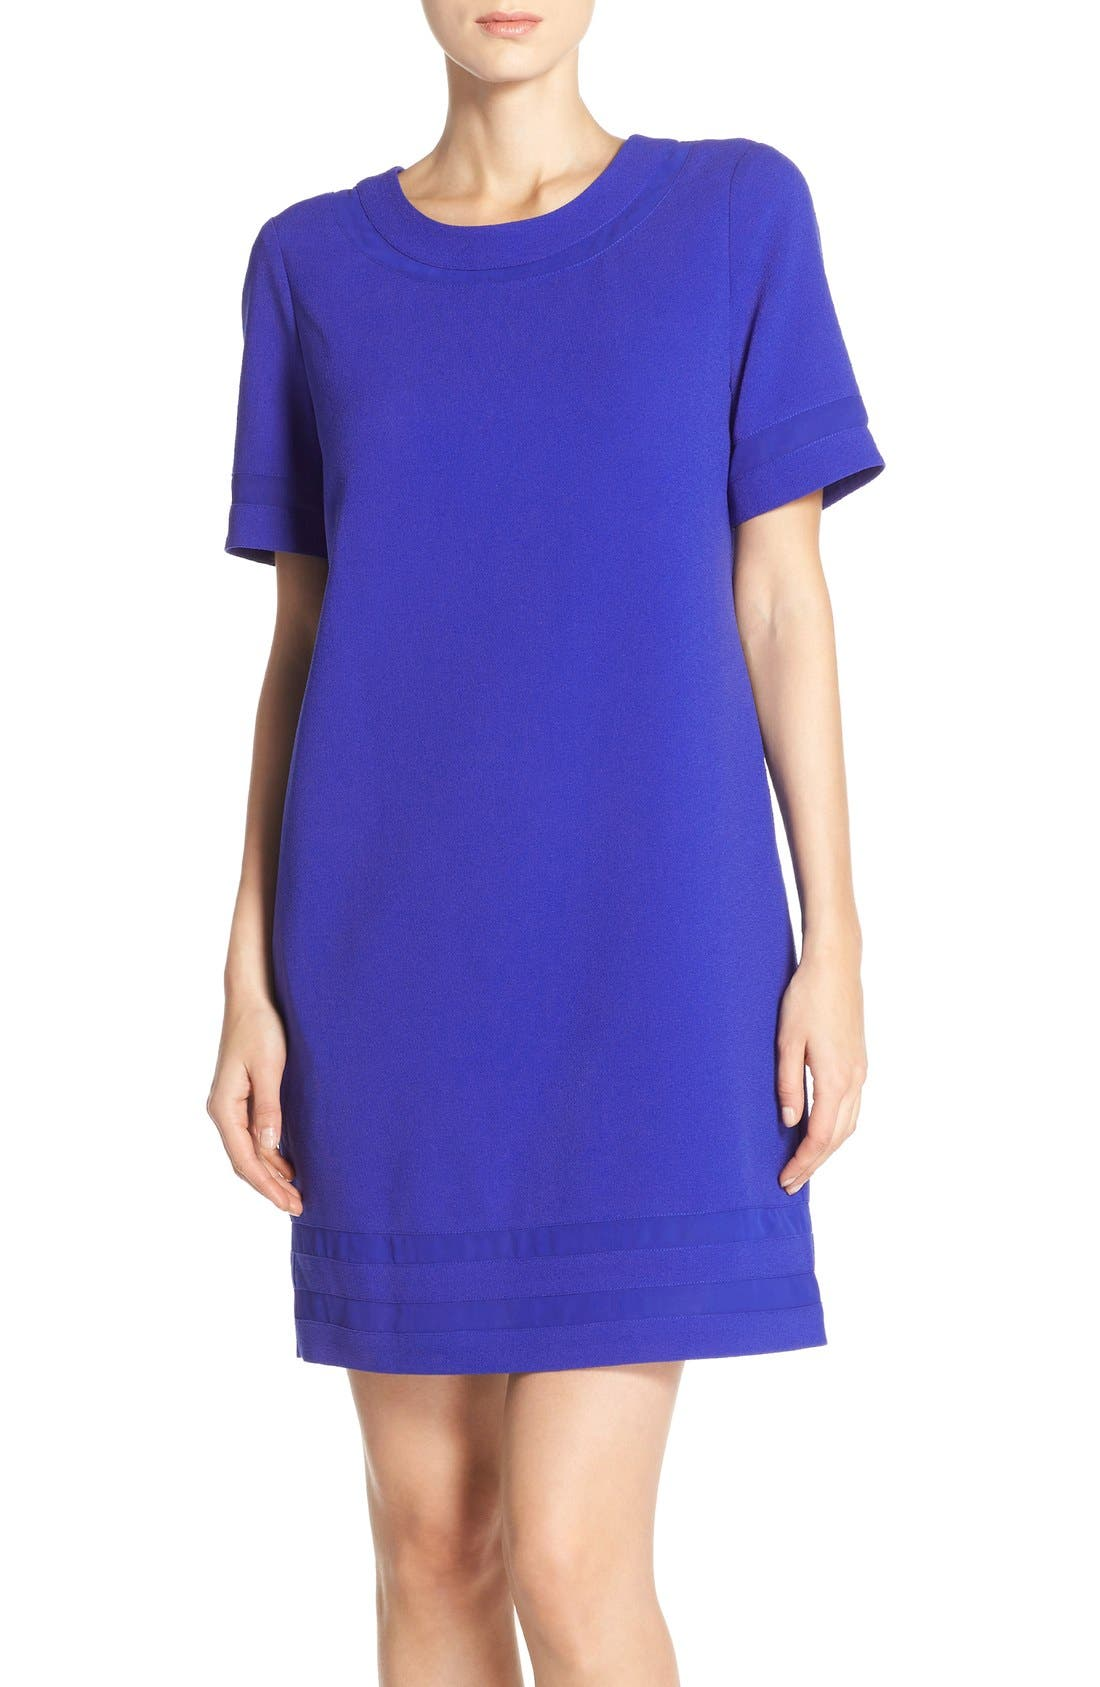 Alternate Image 1 Selected - Marc New York Short Sleeve Crepe Shift Dress